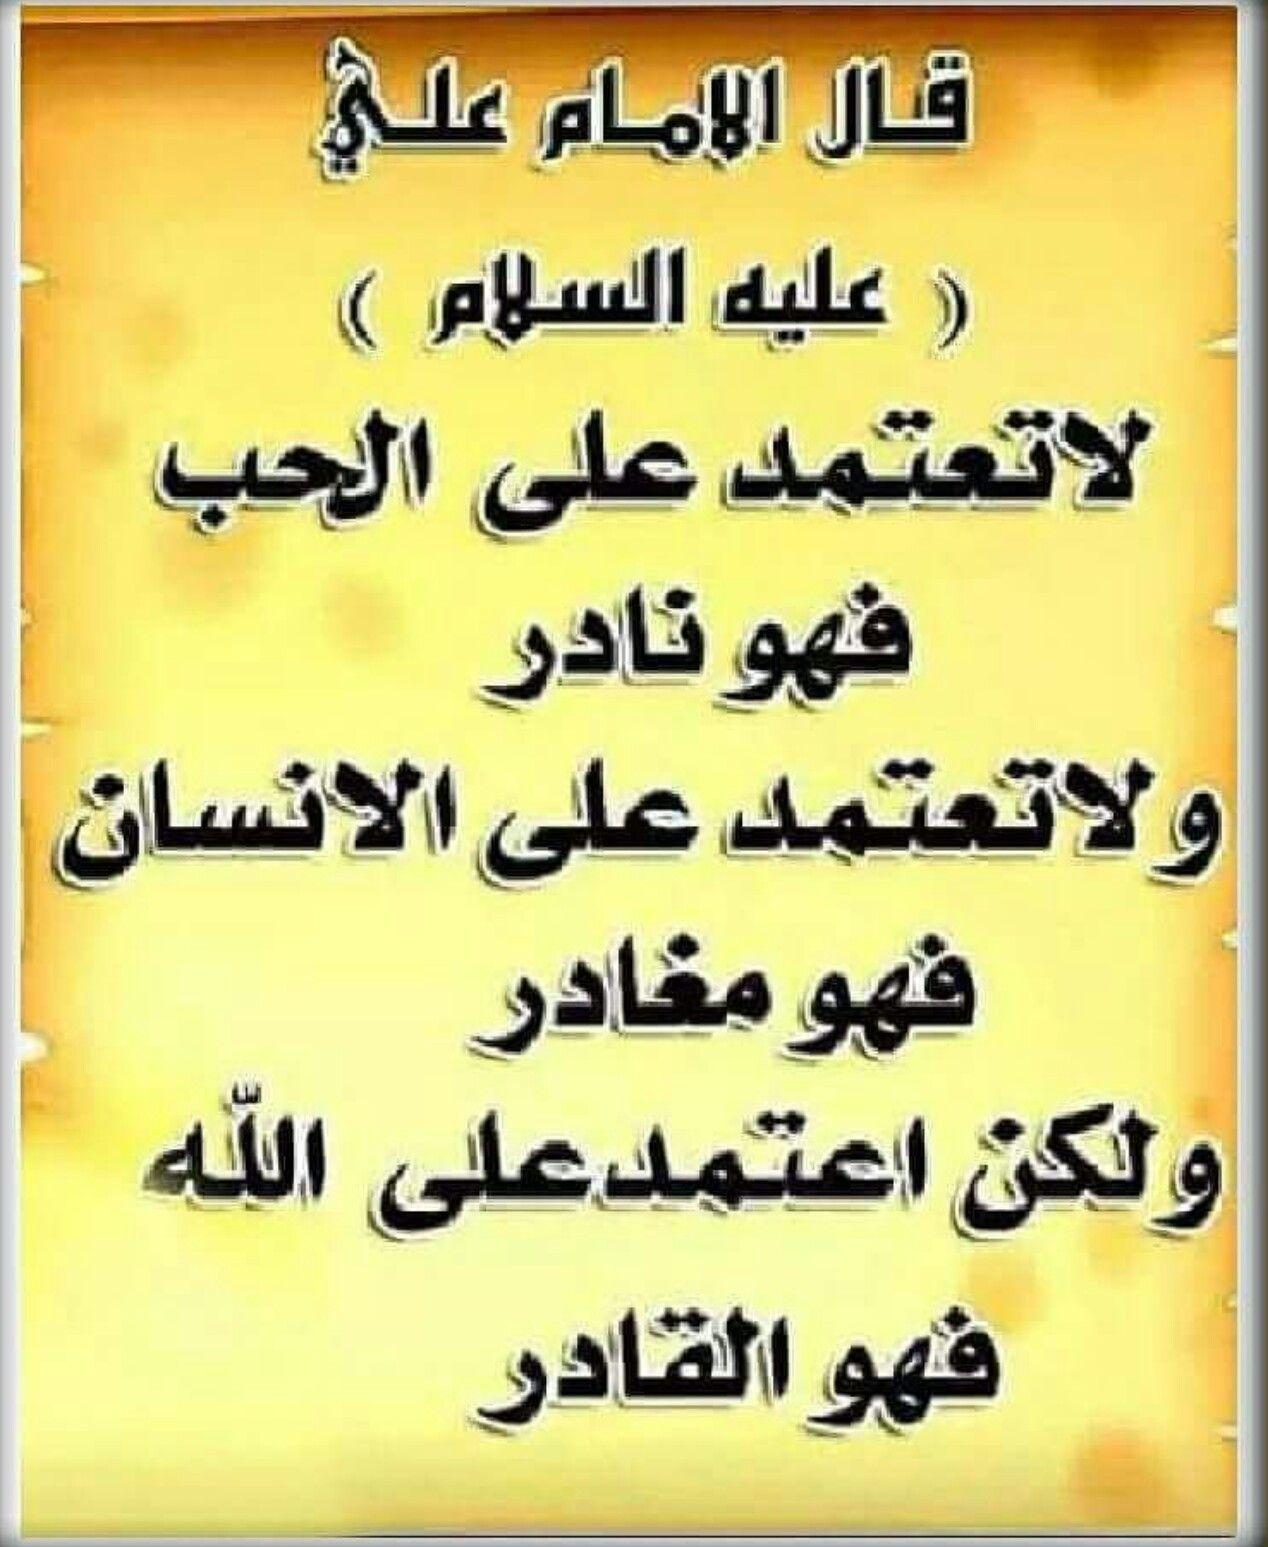 قال الامام علي عليه السلام Quotes Words Arabic Quotes